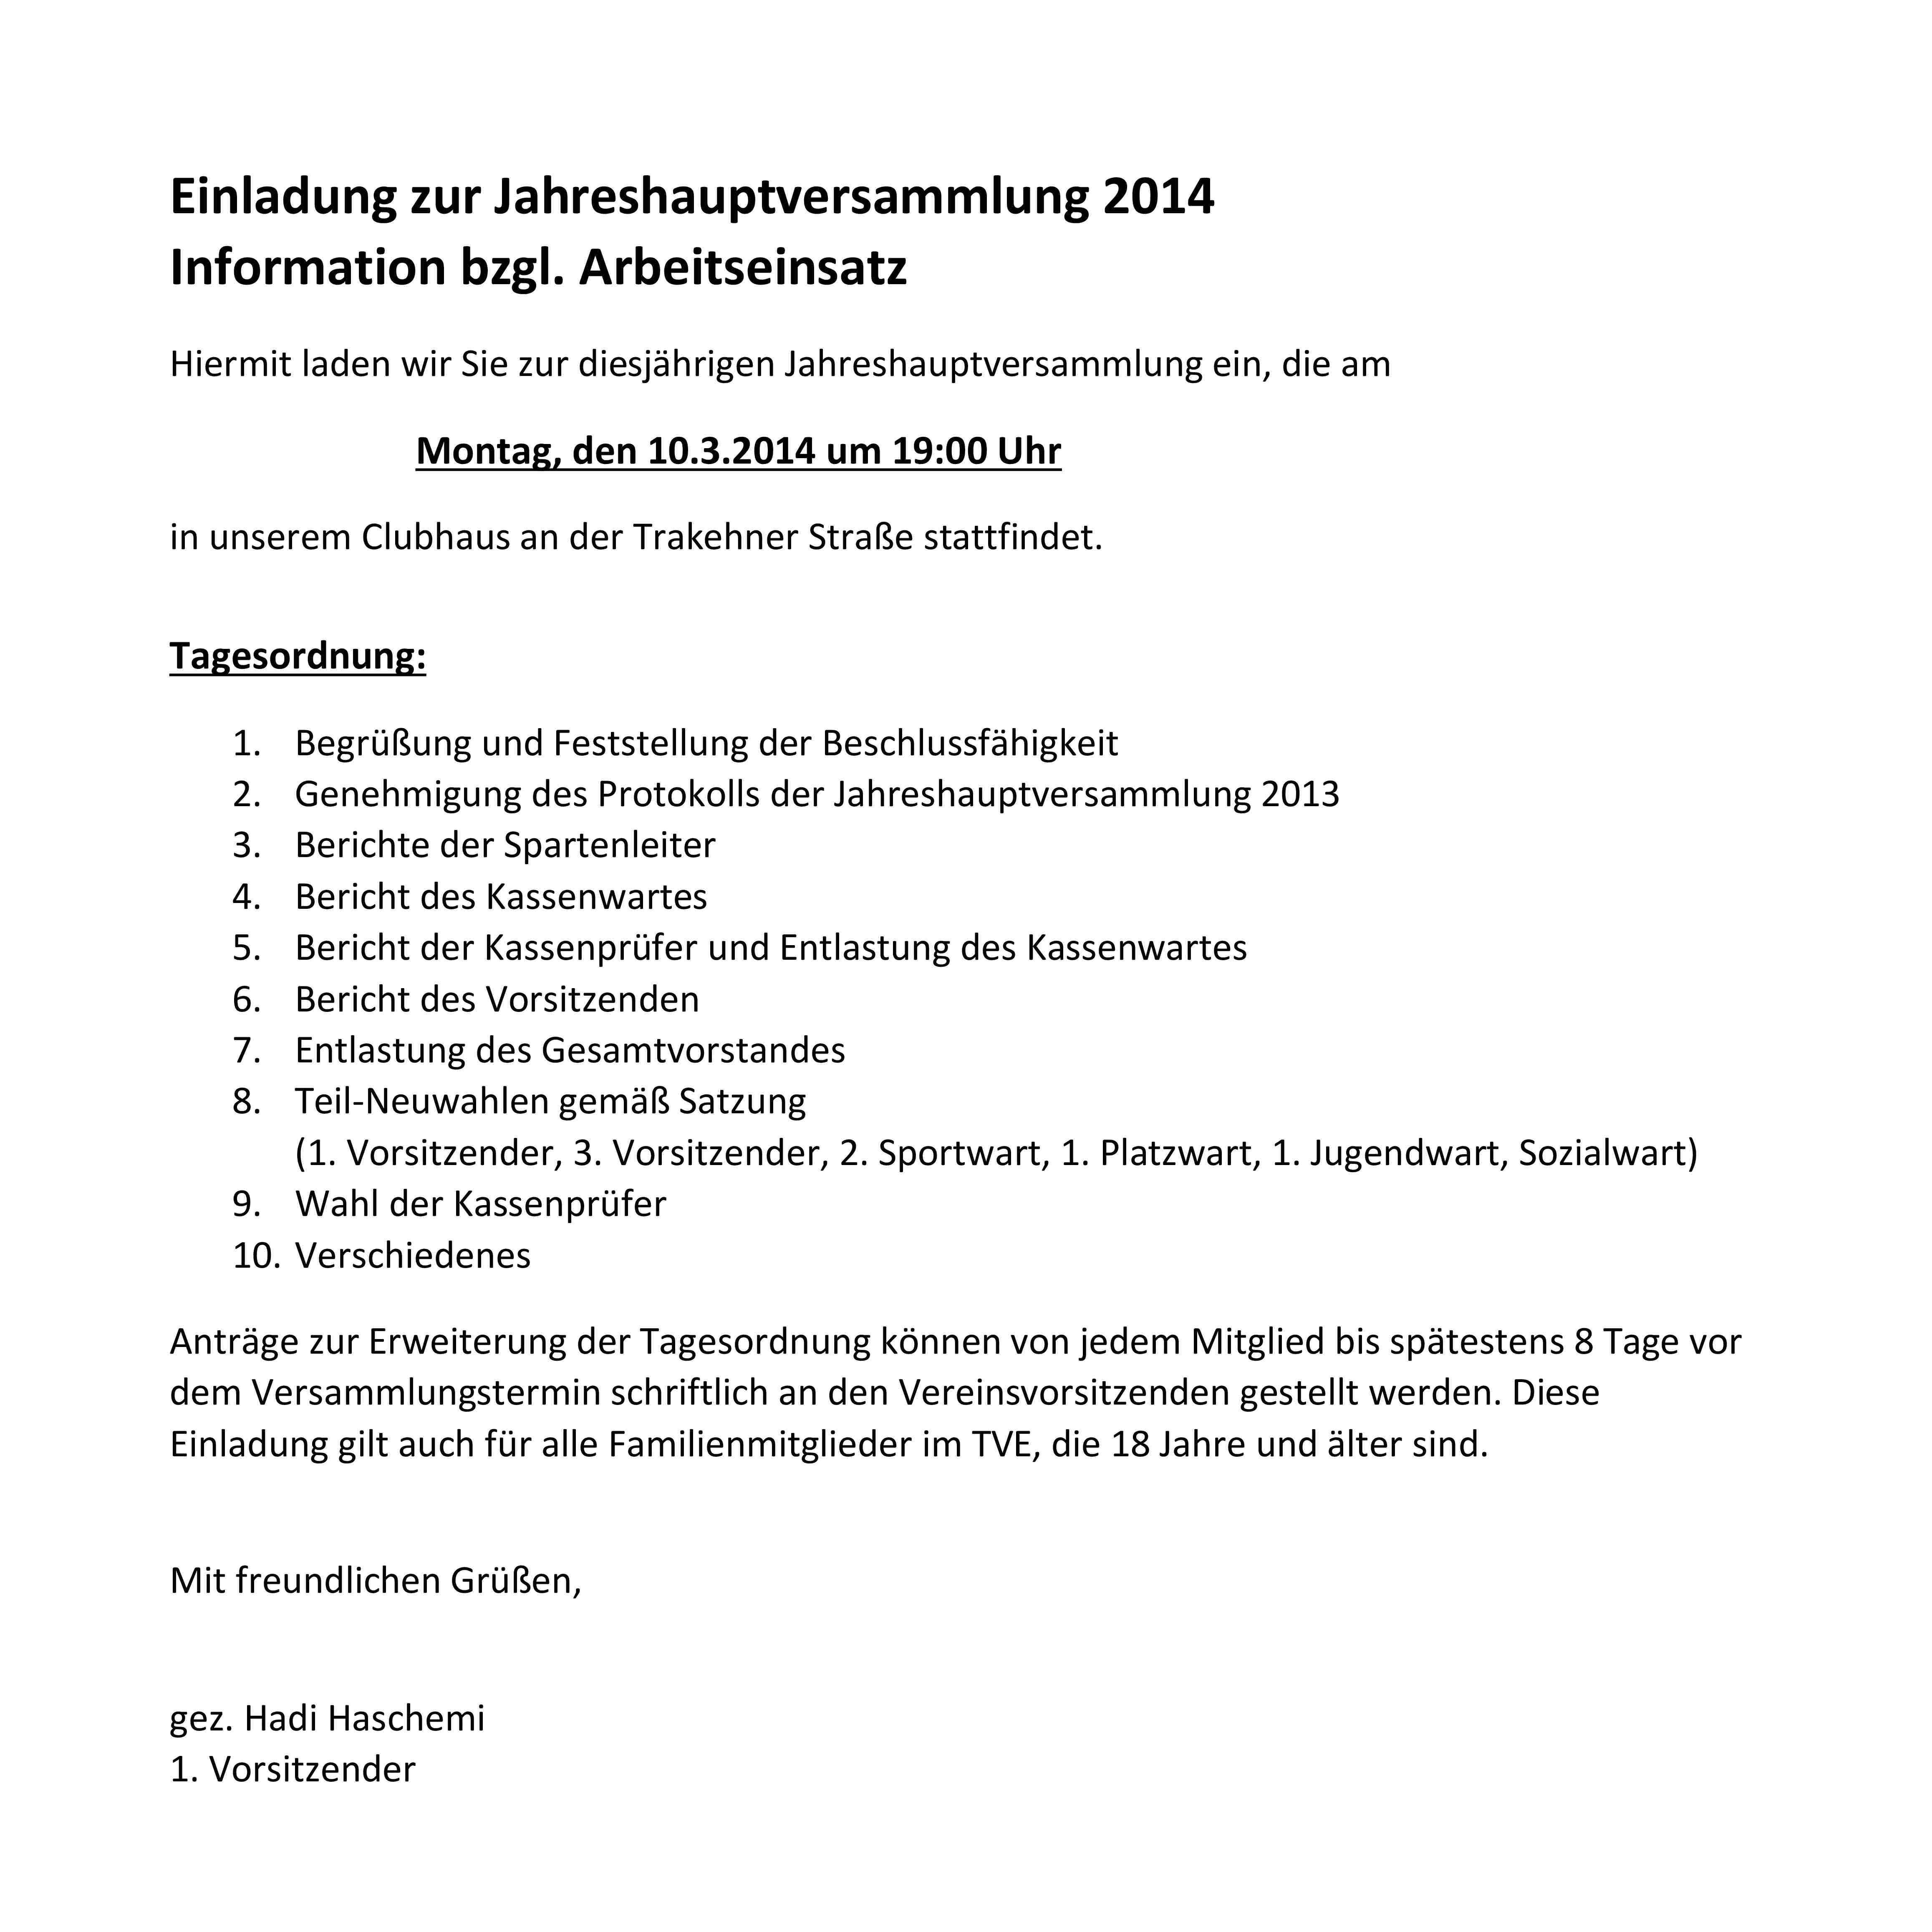 jahreshauptversammlung am 10.03.2014: tv espelkamp-mittwald e.v., Einladung